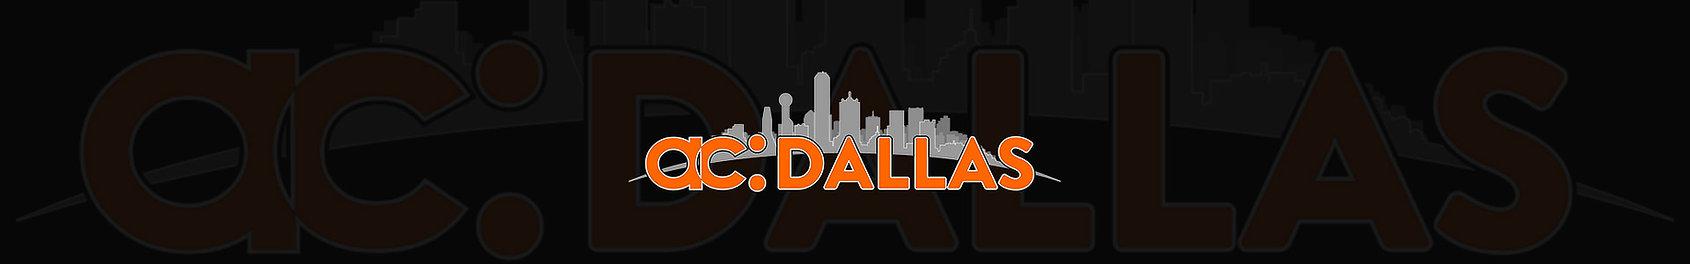 LogoBar_acDallas.jpg